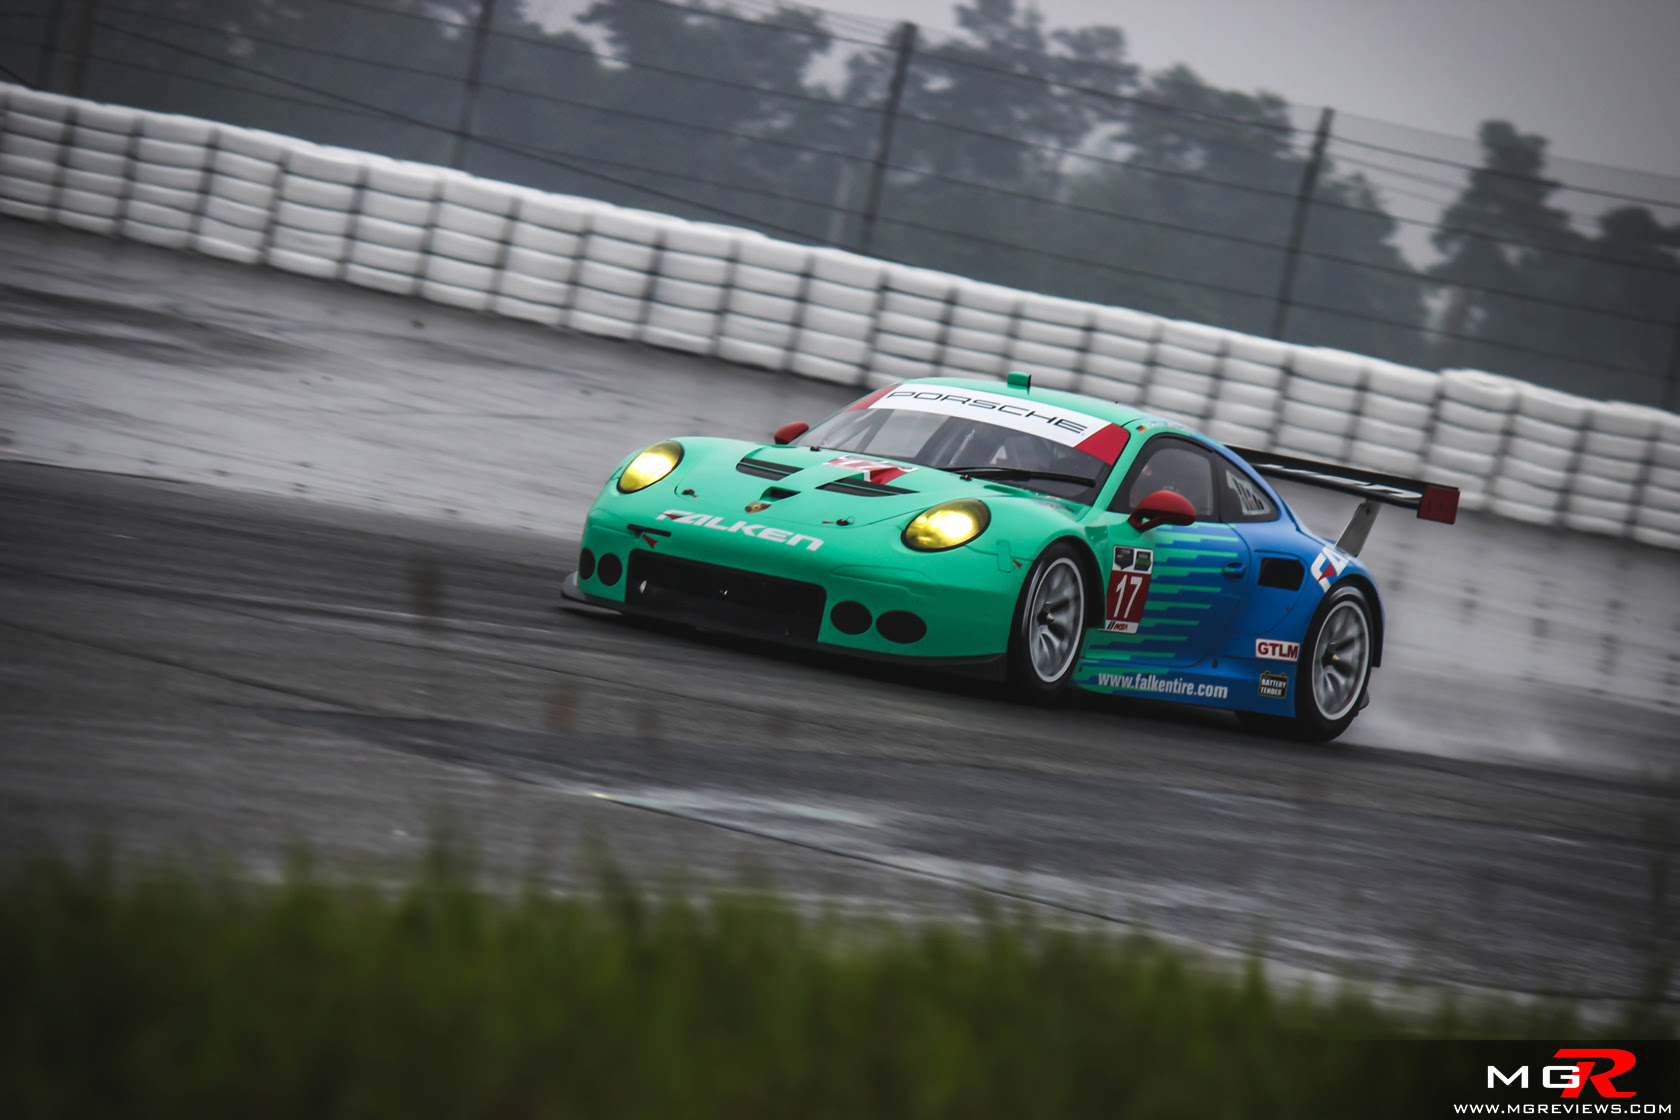 Photos: 2014 IMSA TUDOR United Sports car Series part 2 \u2013 Warm up \u0026 Race  M.G. Reviews